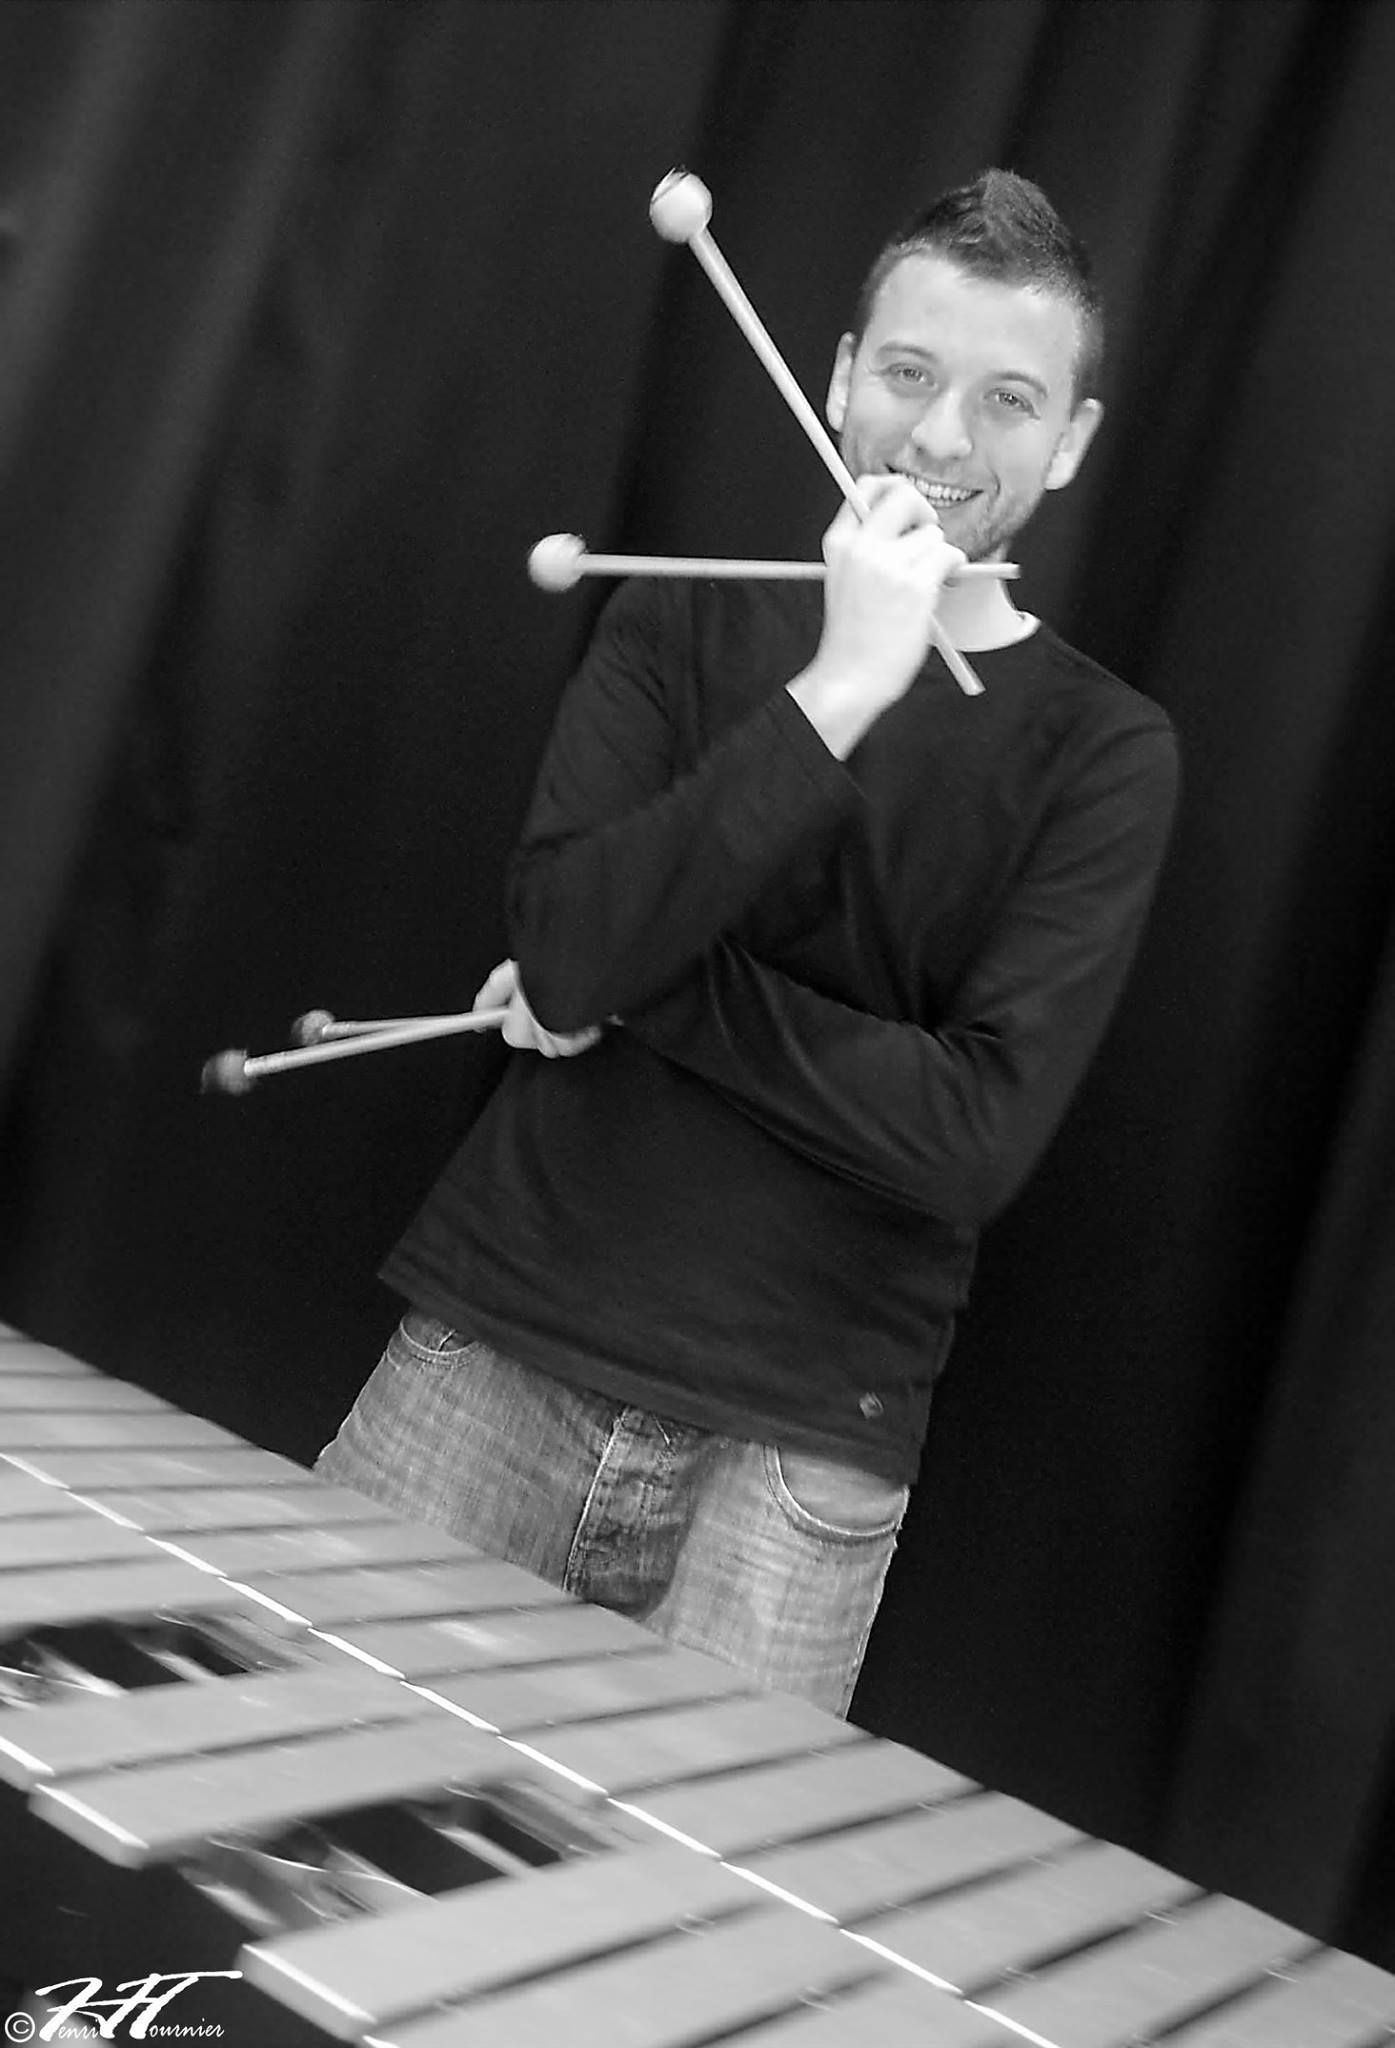 Sébastien-gisbert-8.jpg